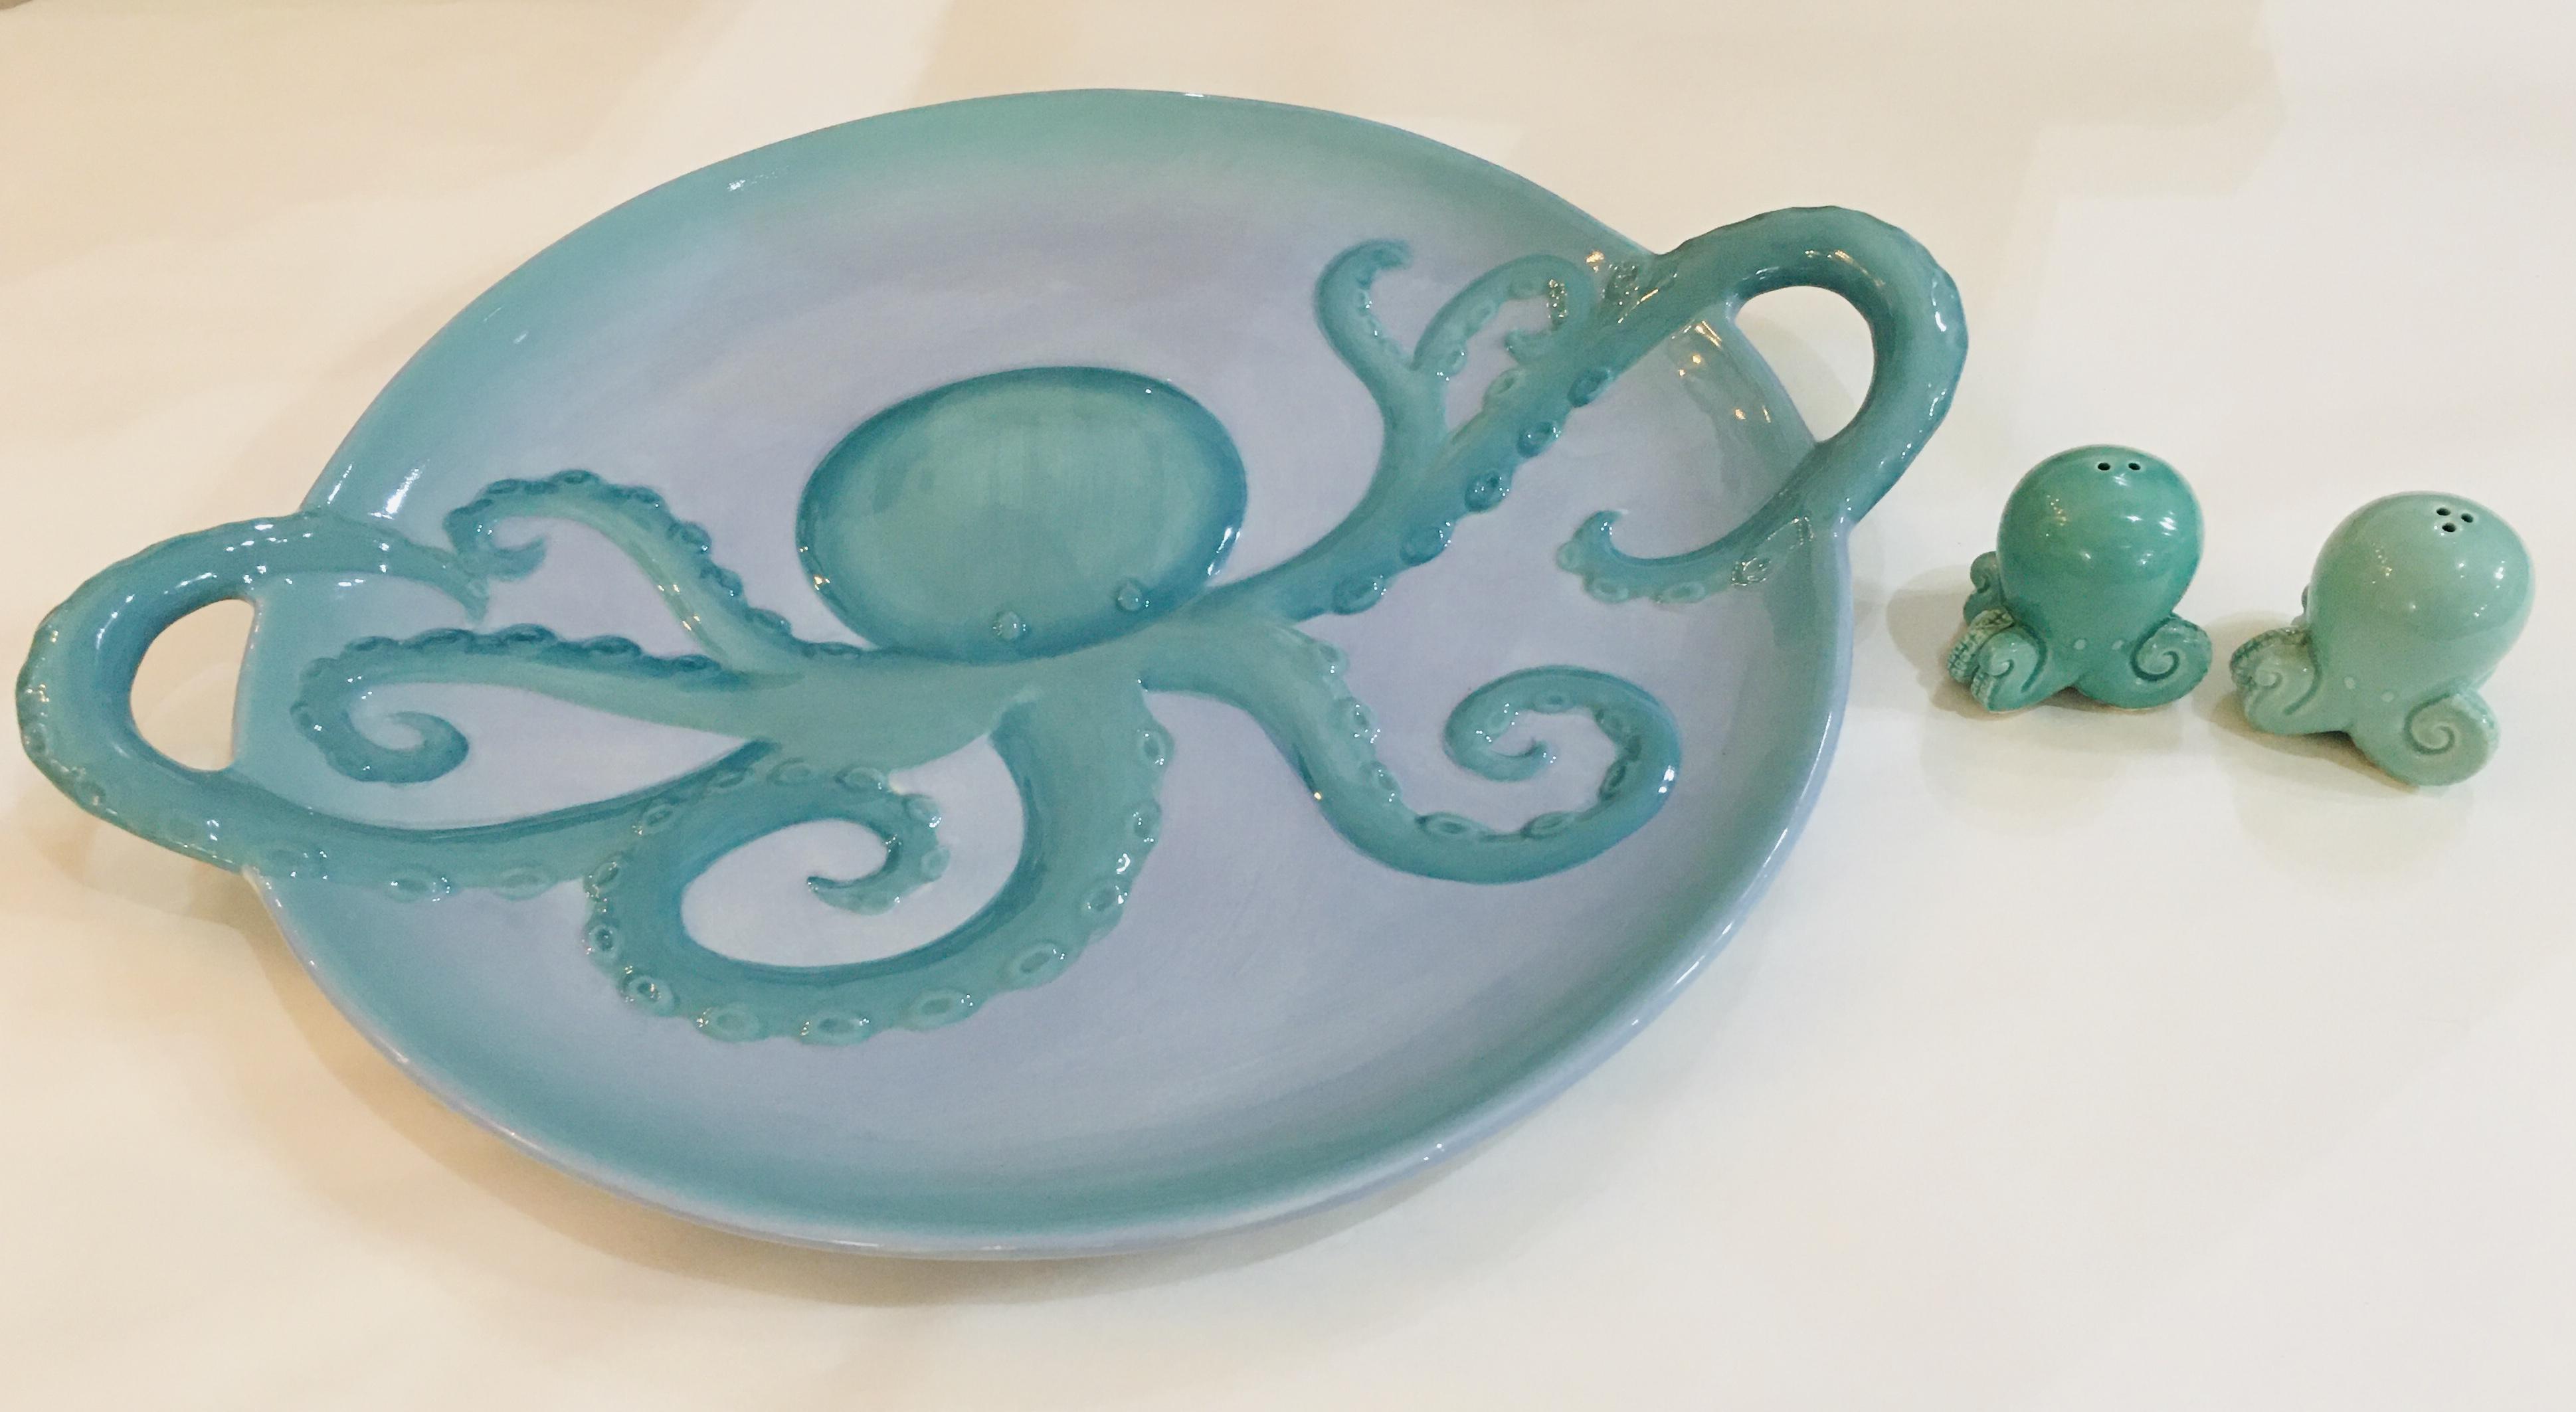 Octopus Stoneware Platter